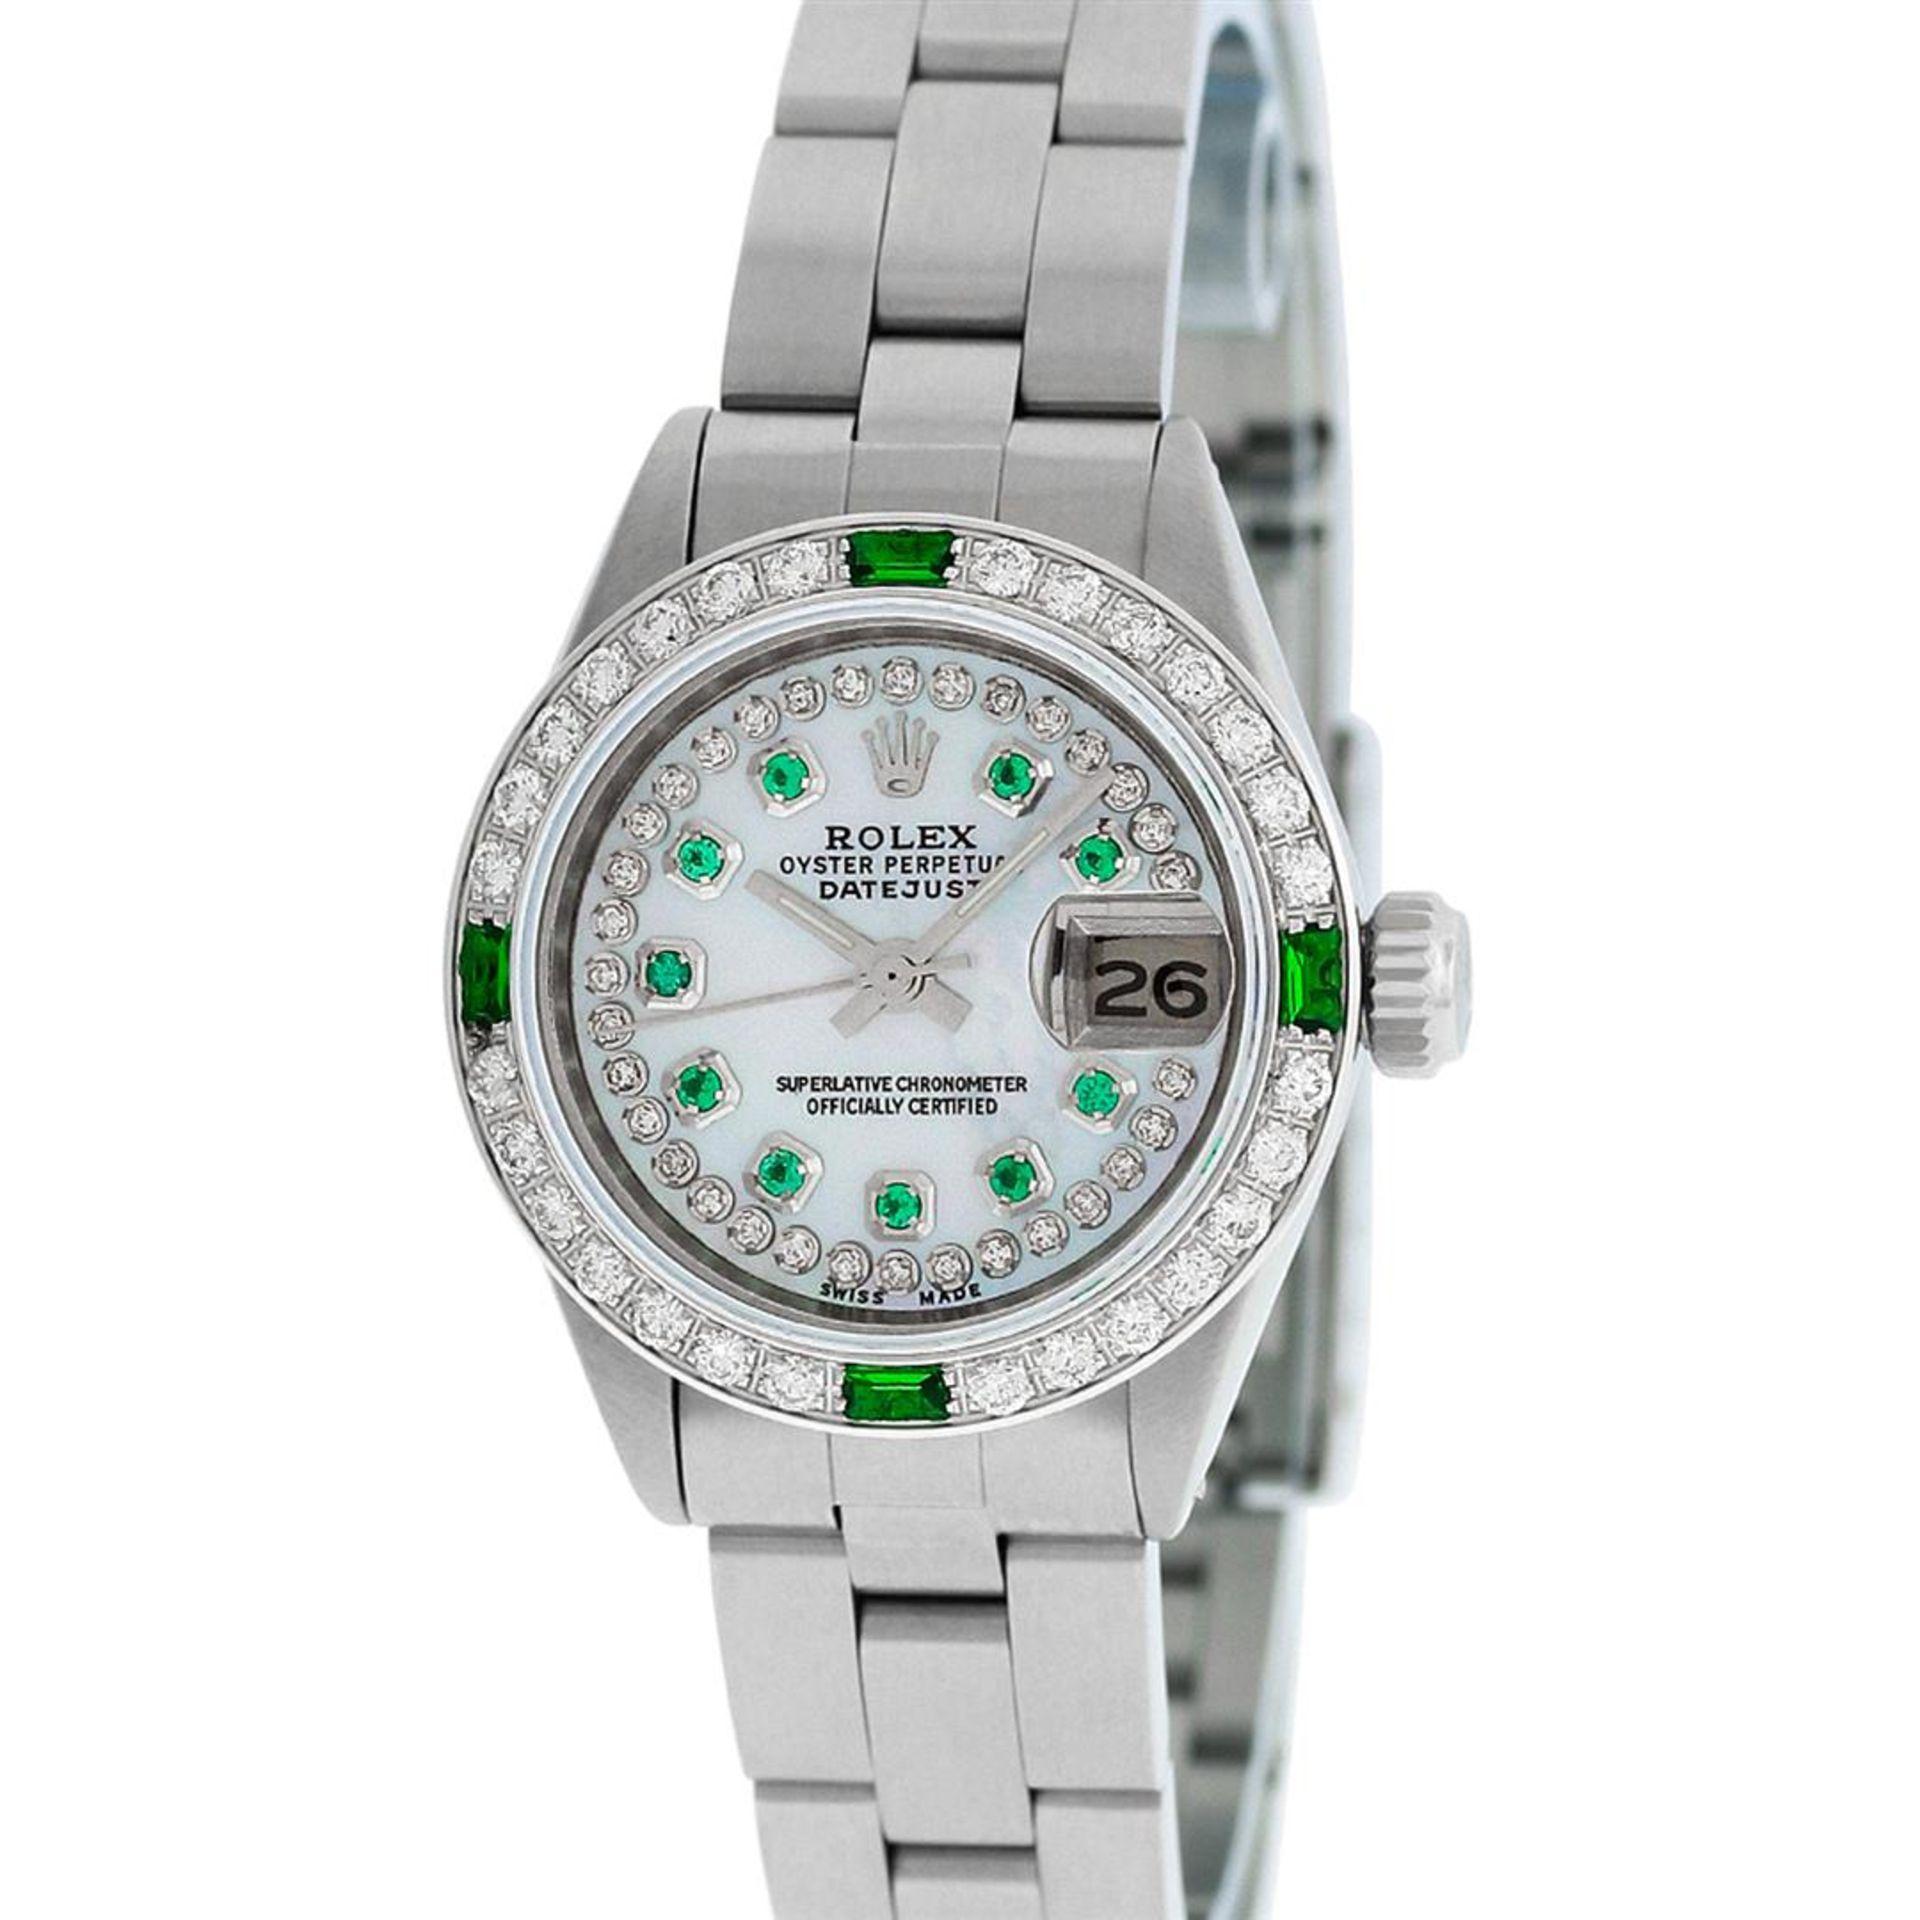 Rolex Ladies Stainless Steel MOP Emerald & Diamond Oyster Perpetaul Datejust Wri - Image 3 of 9